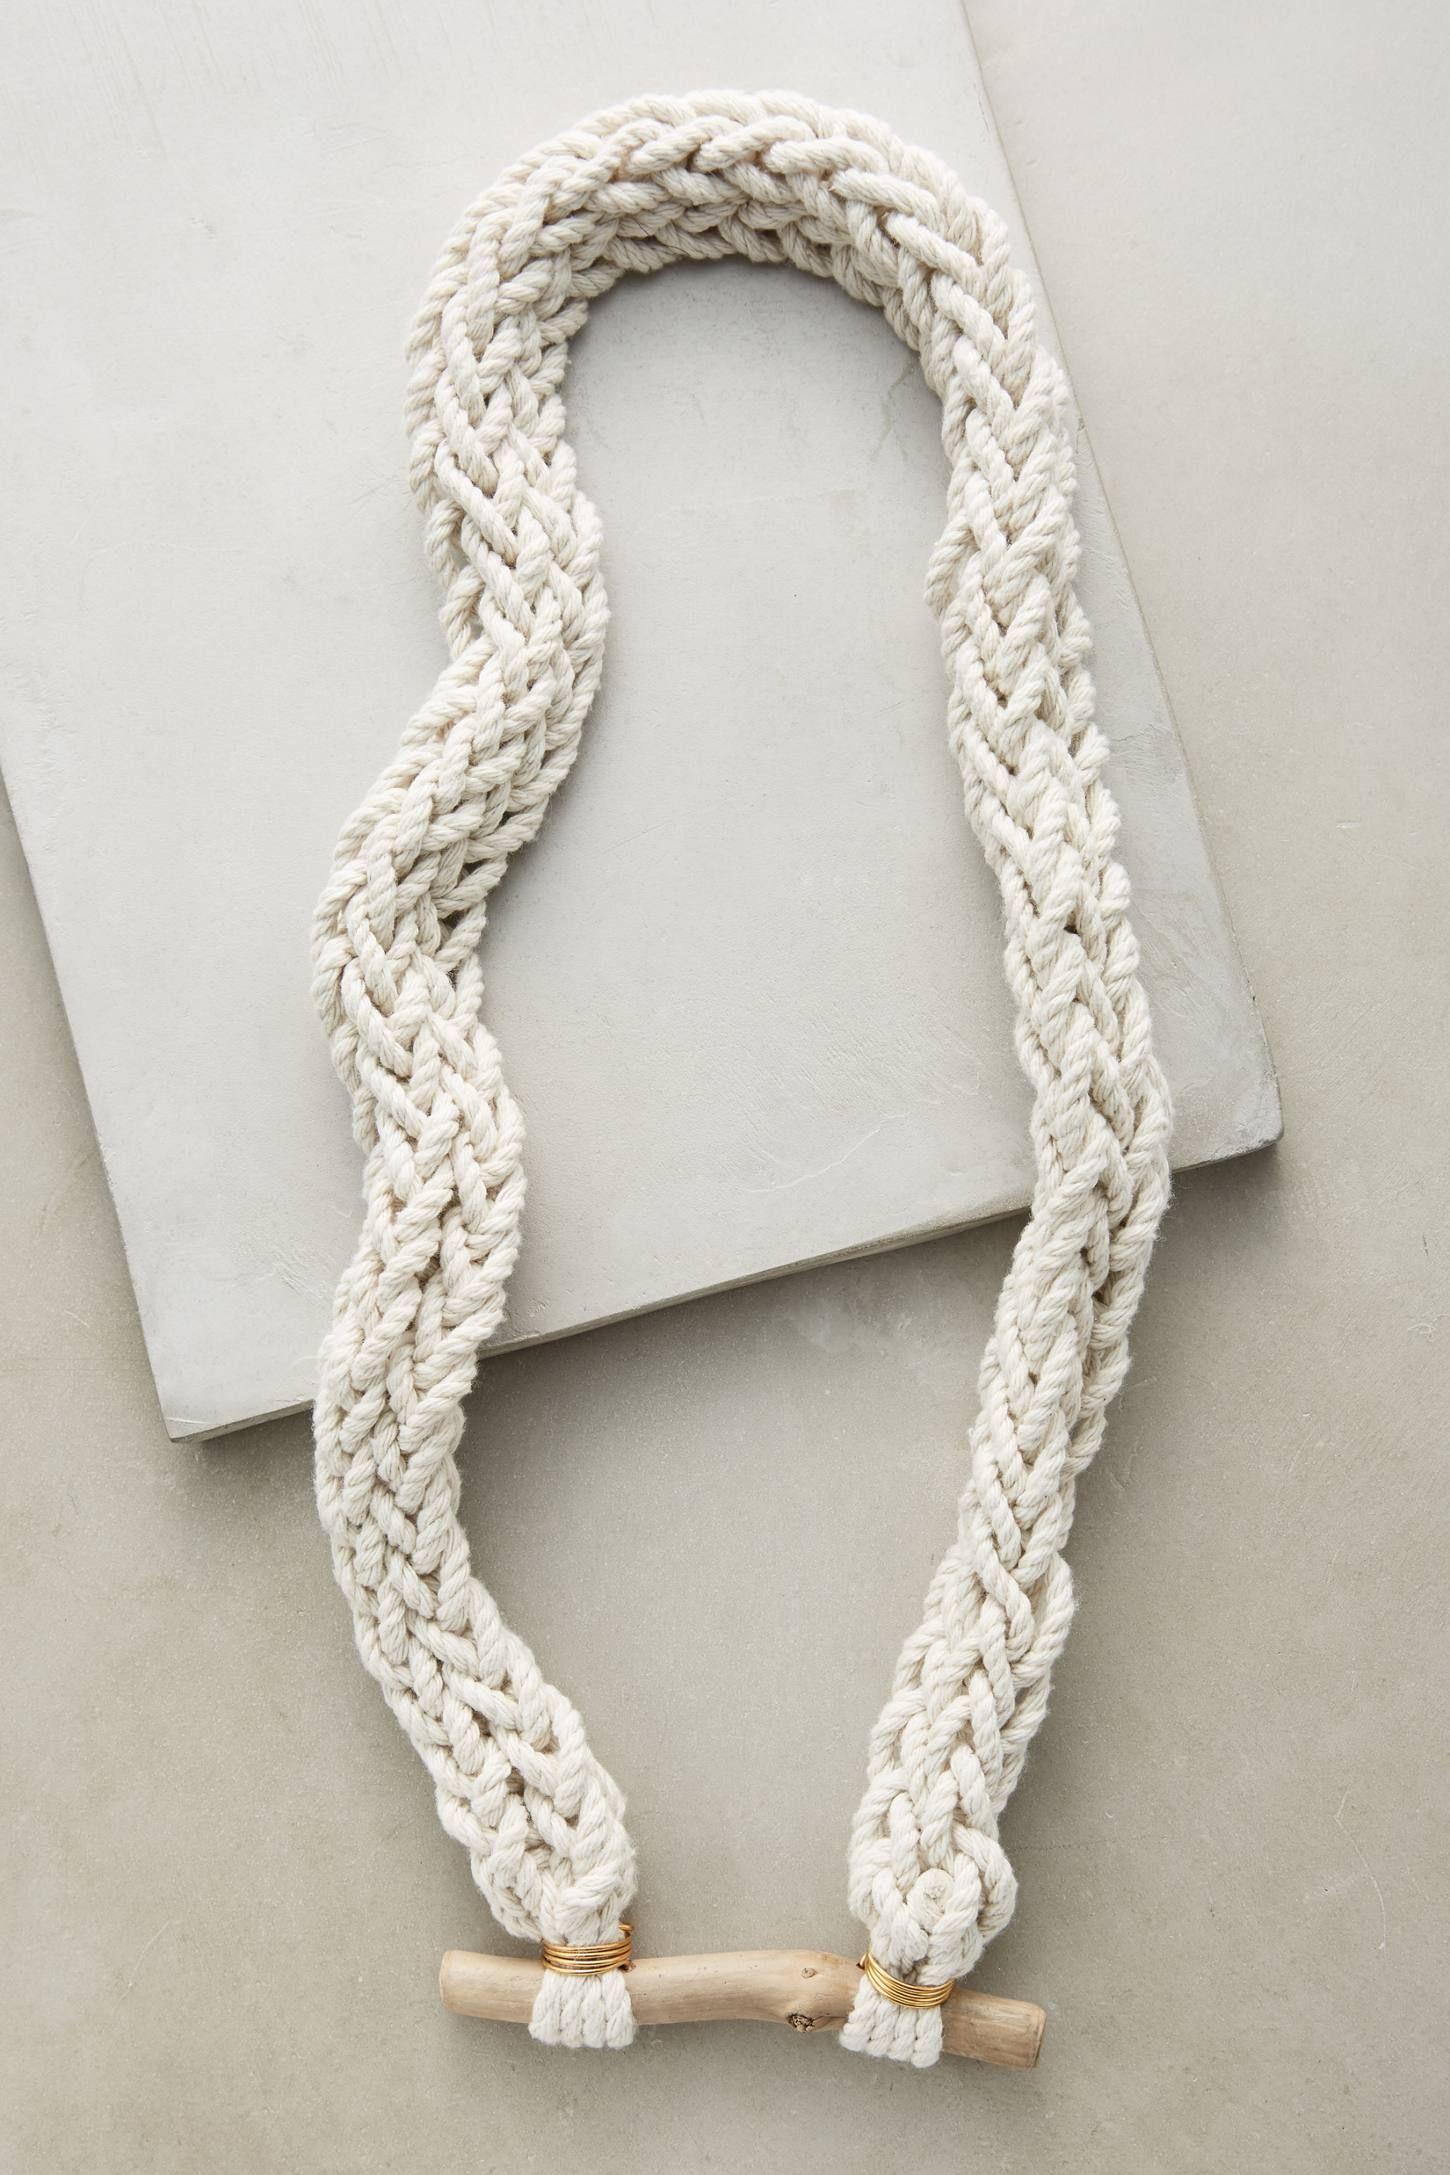 Bound Branch Necklace - anthropologie.com